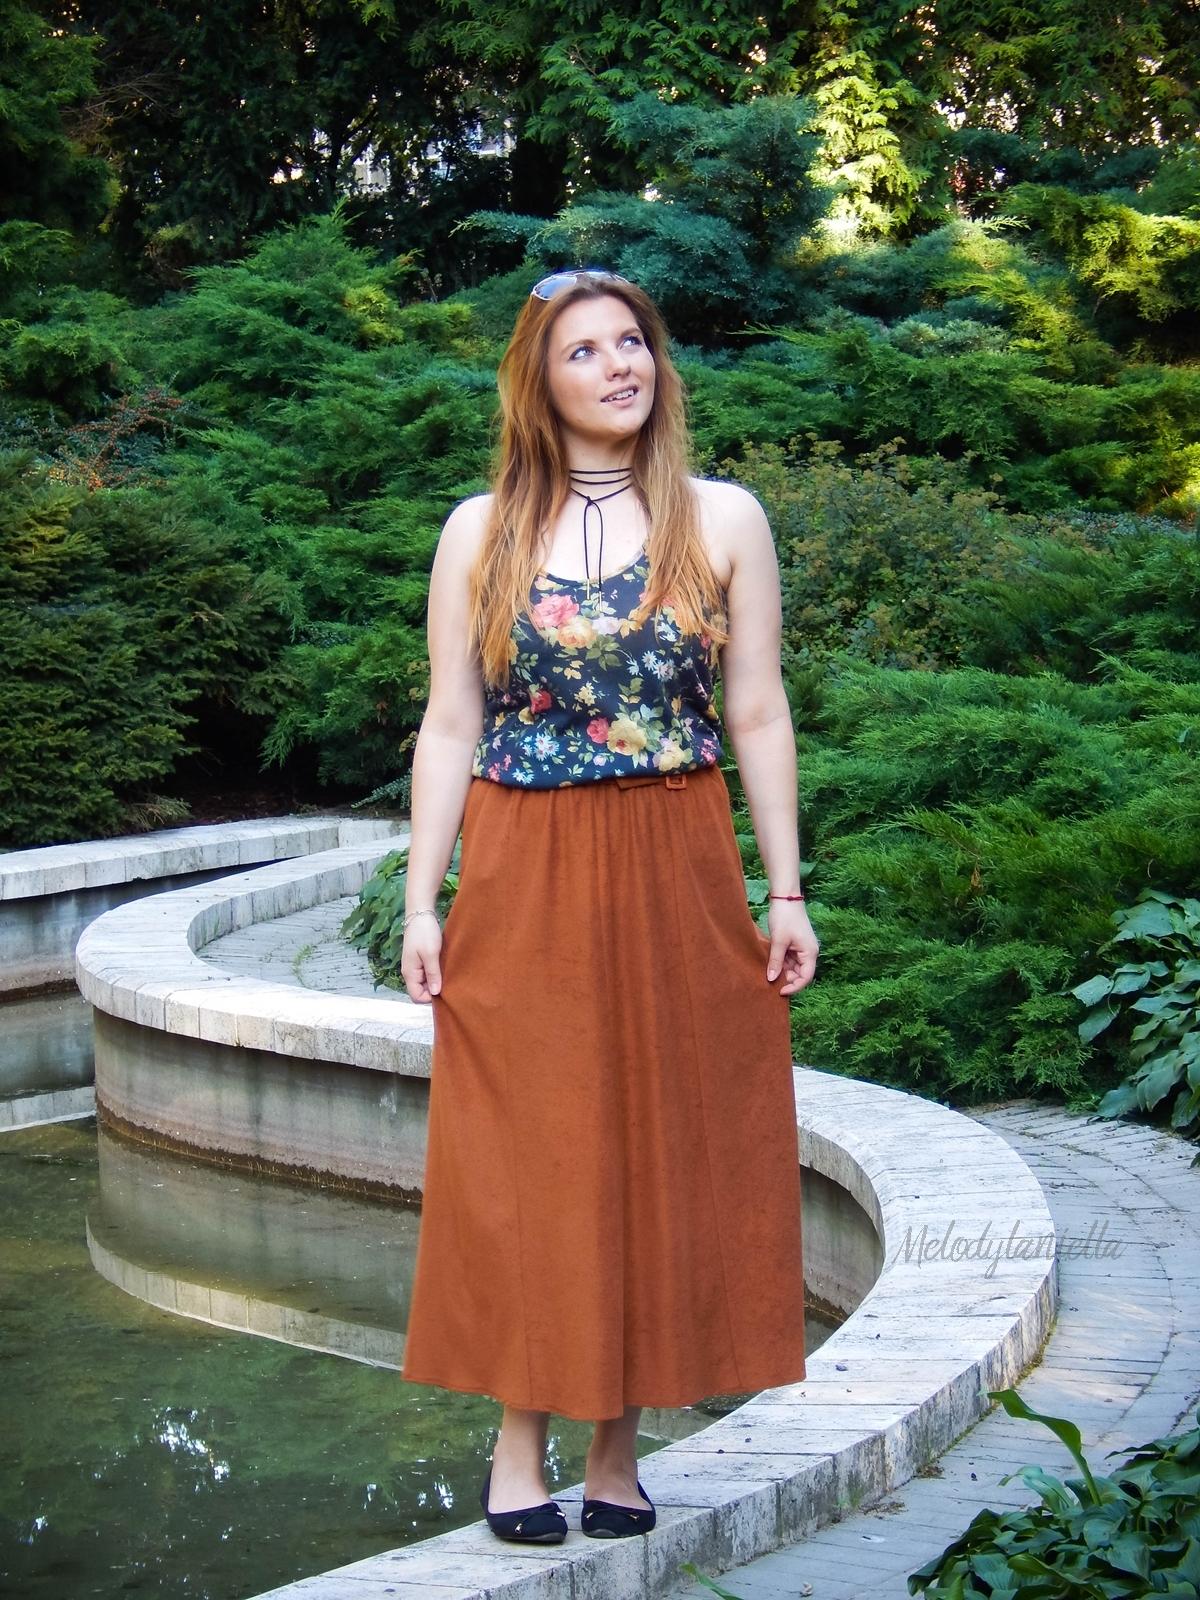 ruda spodnica mamy kolorowy top river islands czarna torebka manzana lookbook na jesien jak nosic spodnice maxi